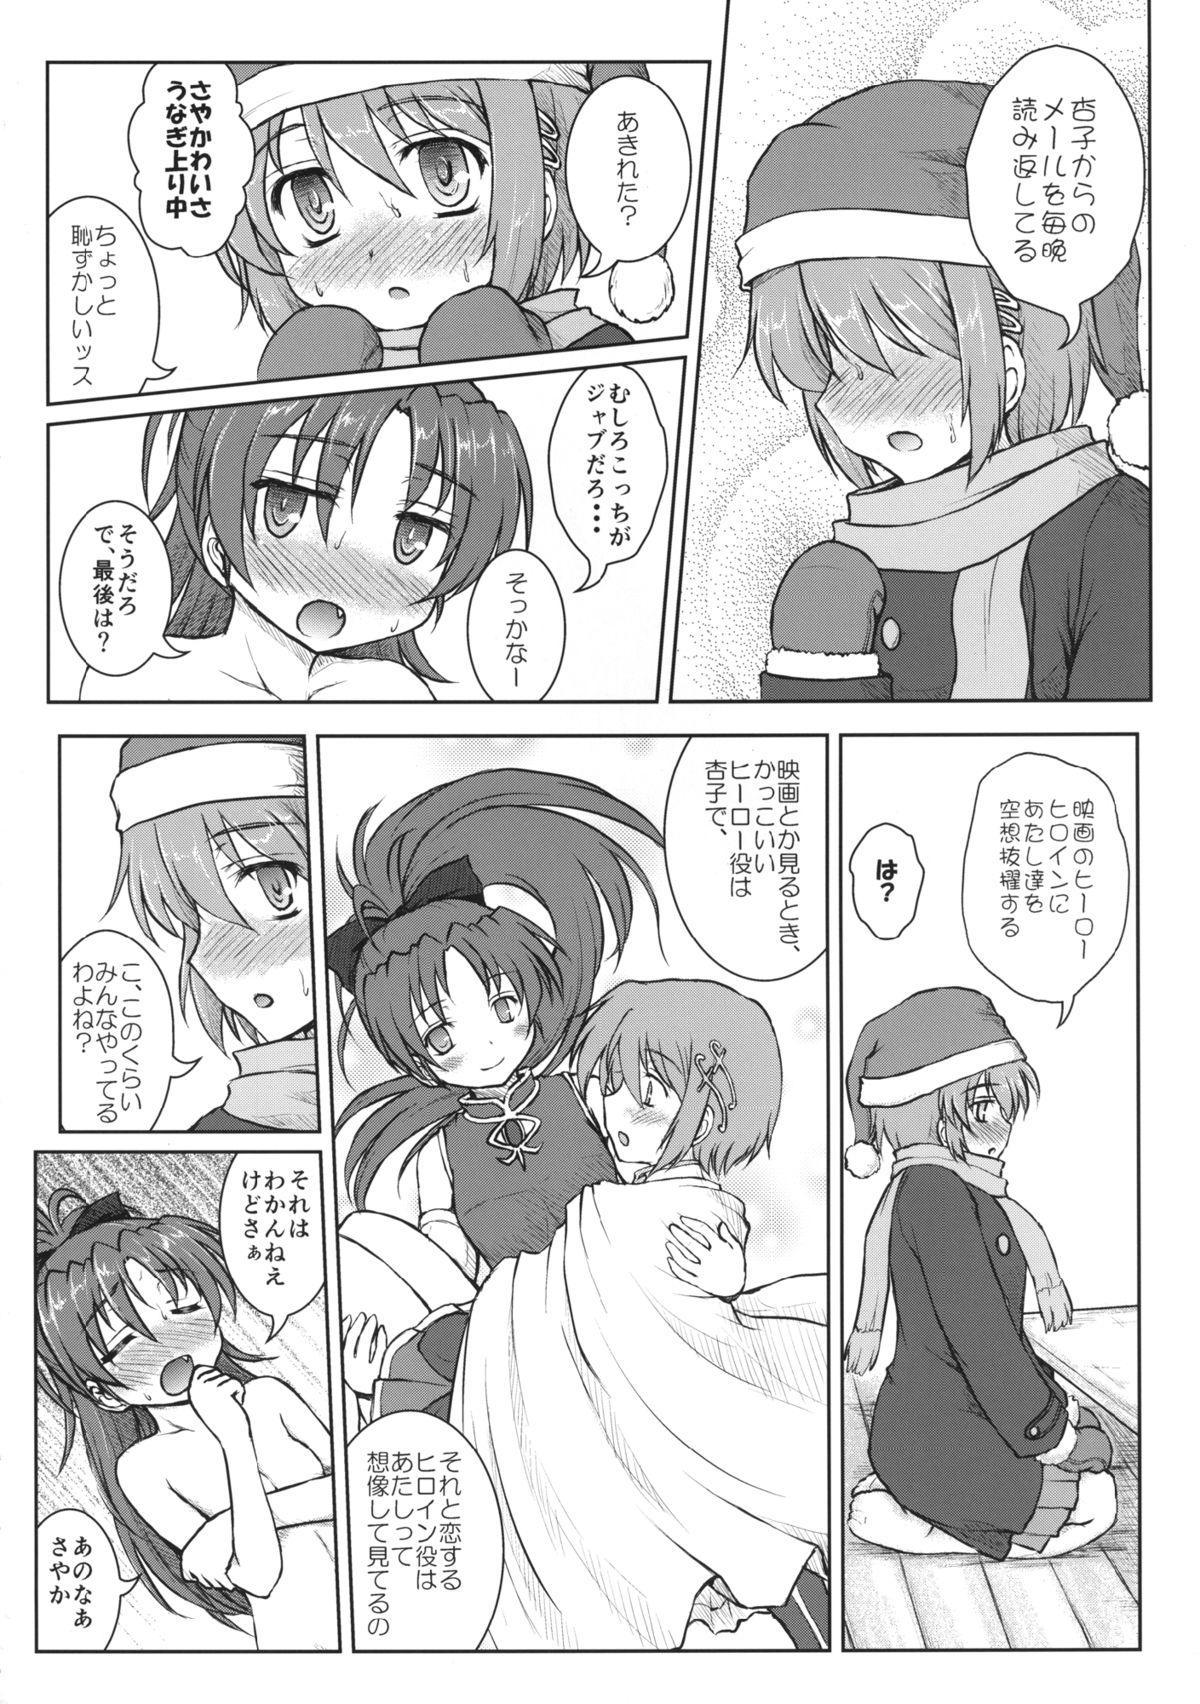 (SHT2013 Haru) [Newtype Kenkyuujo (Kotowari)] Sayaka-san to Kyouko-san (Puella Magi Madoka Magica) 21